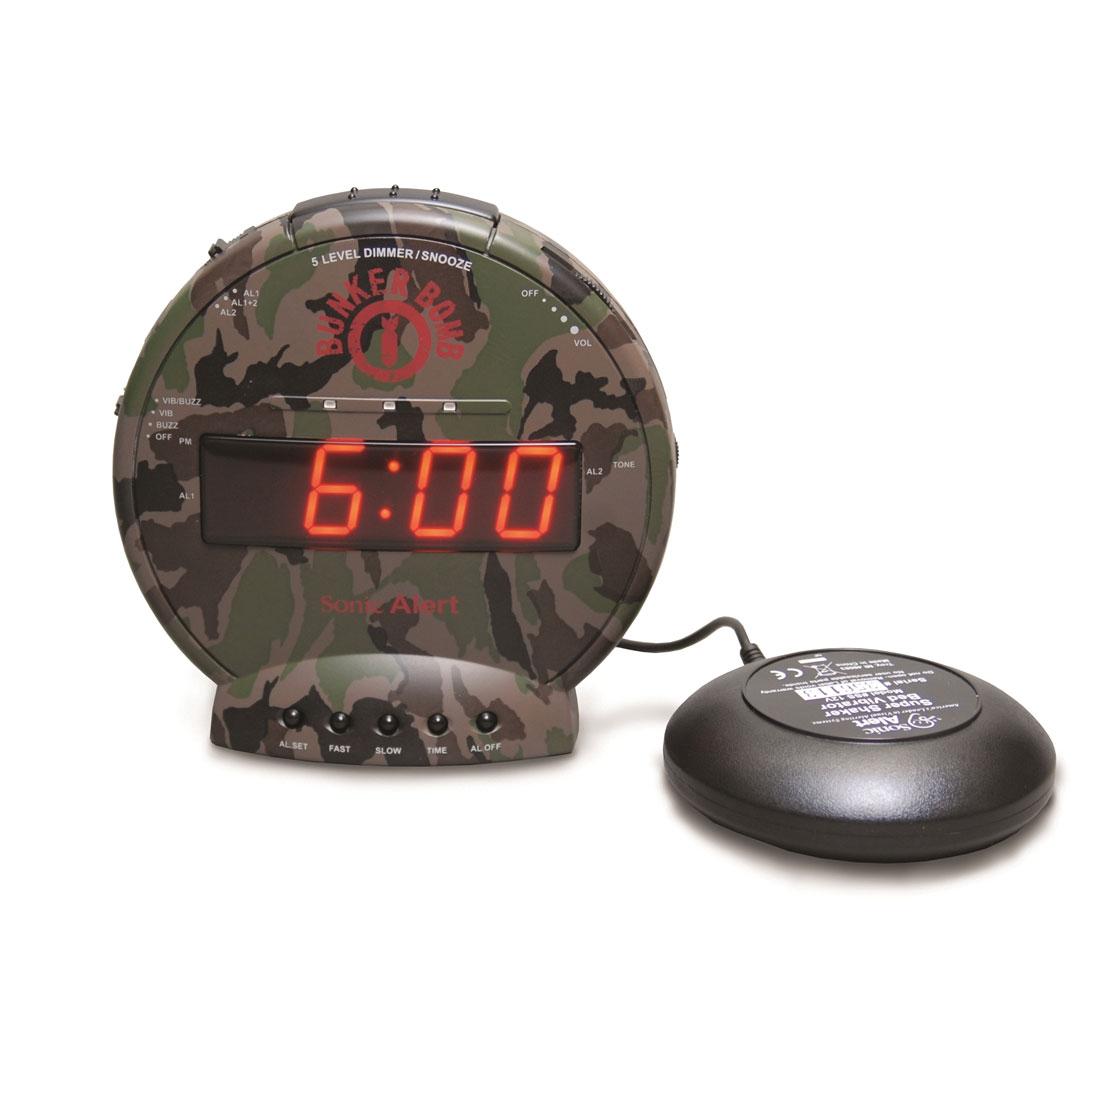 Sonic Alert Bunker Bomb Alarm Clock with Super Shaker SBC575SS